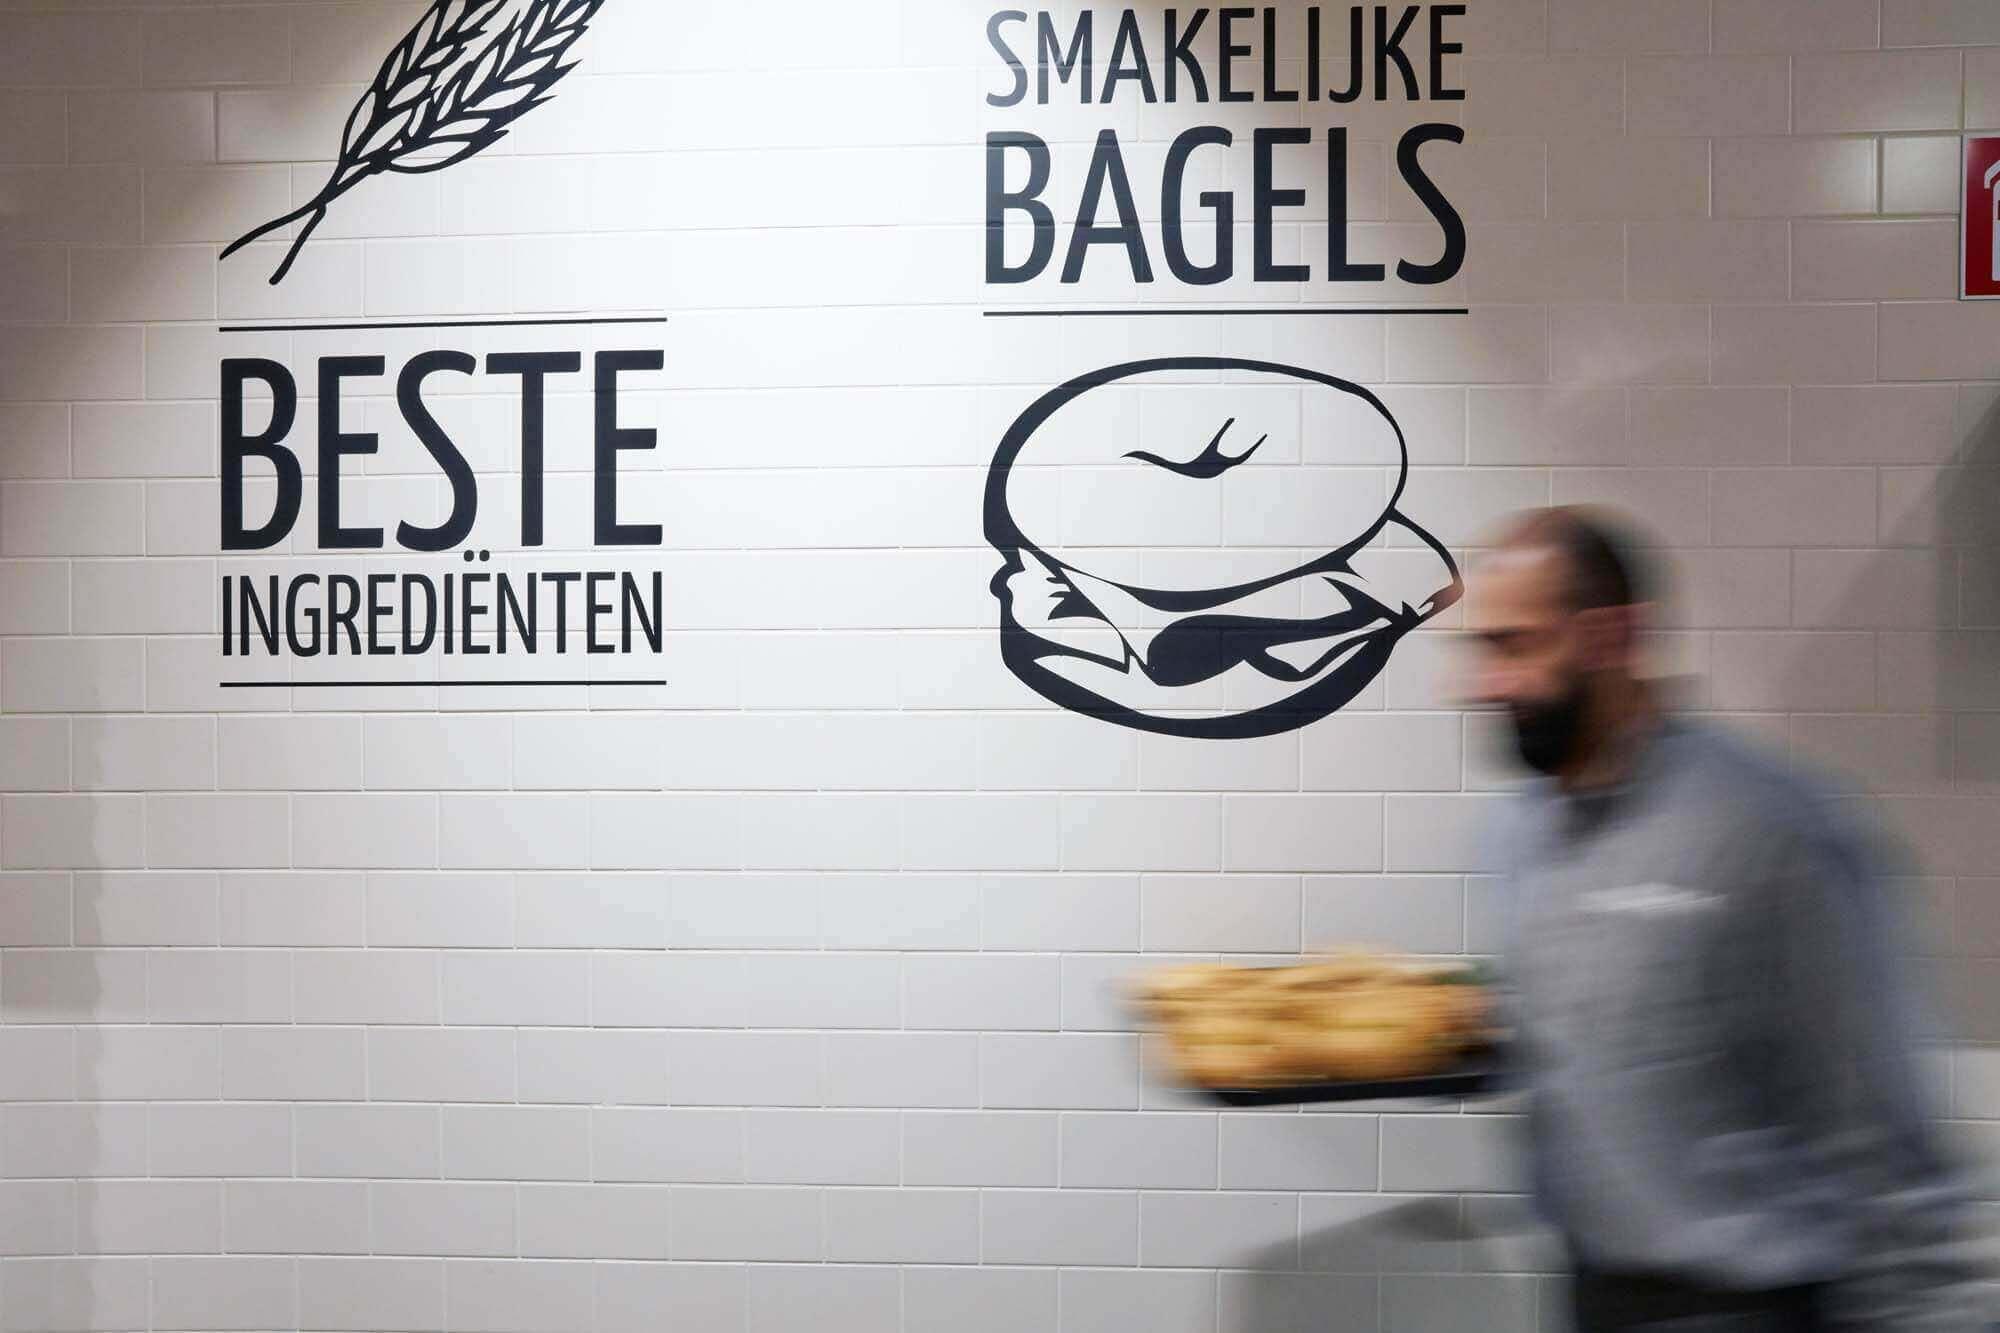 BackWerk, Brauckmann, food service bakery, baking, bread, snacks, Germany